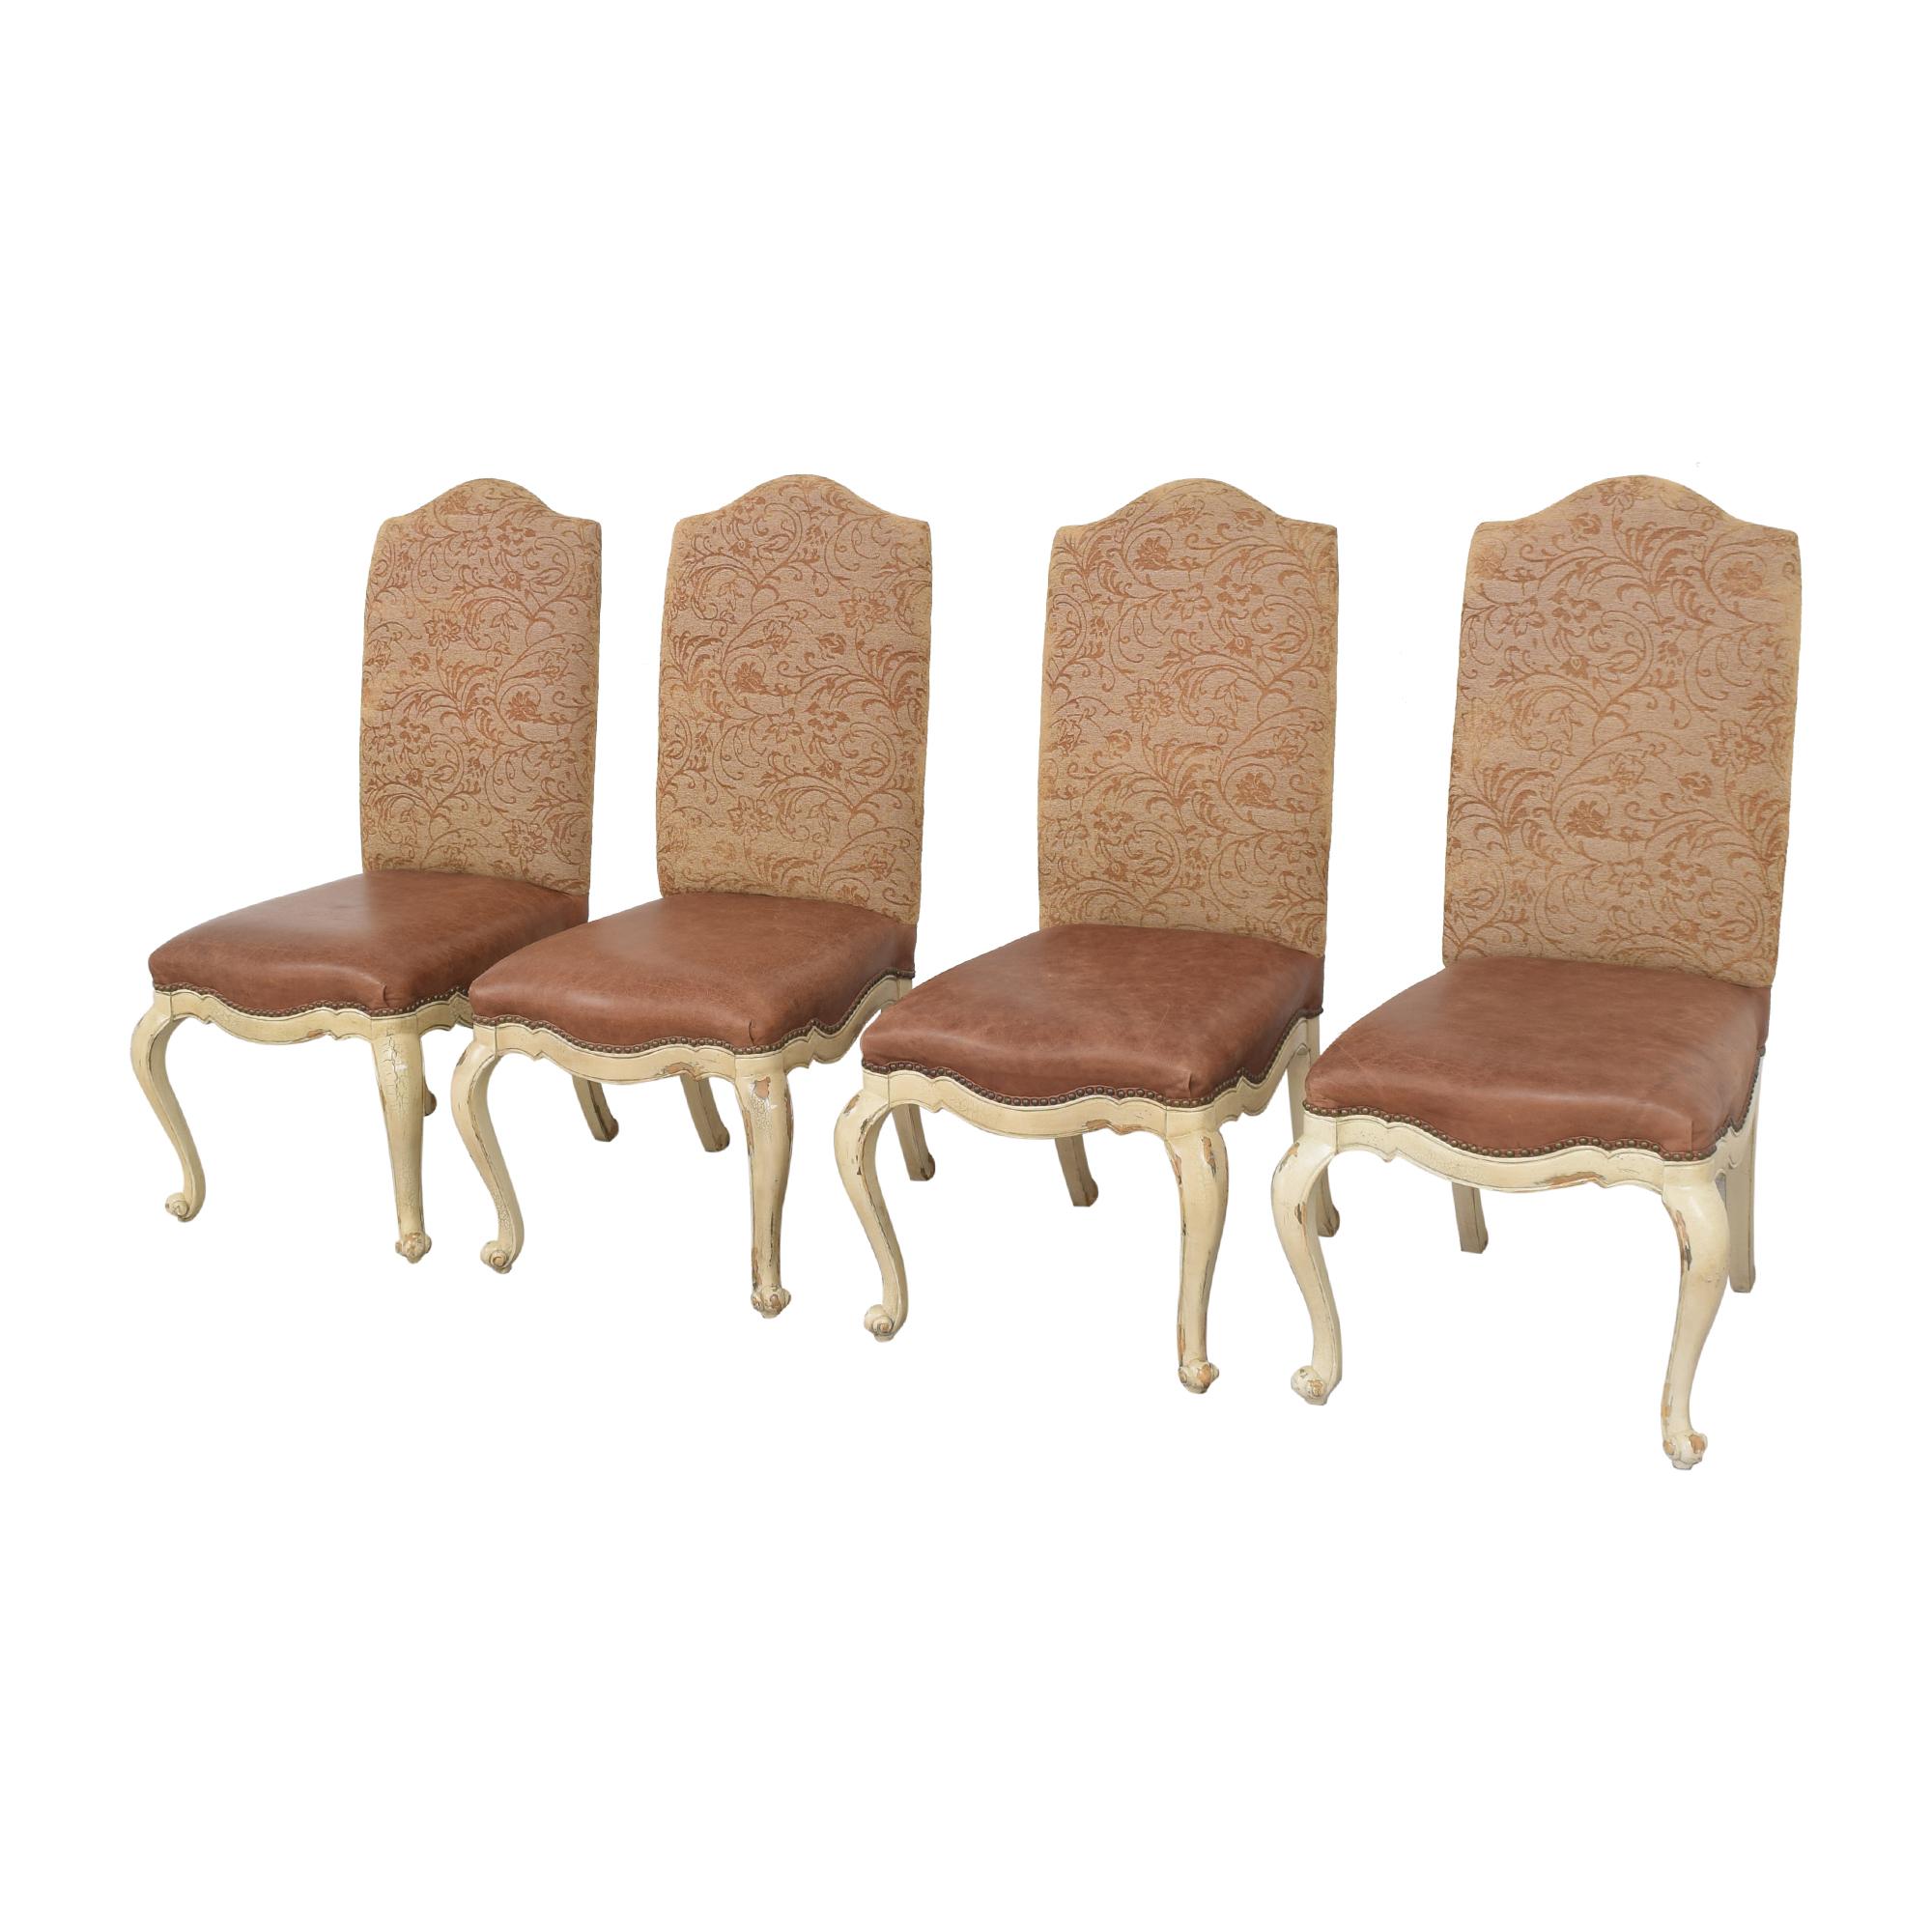 buy Hooker Upholstered Side Chairs Hooker Furniture